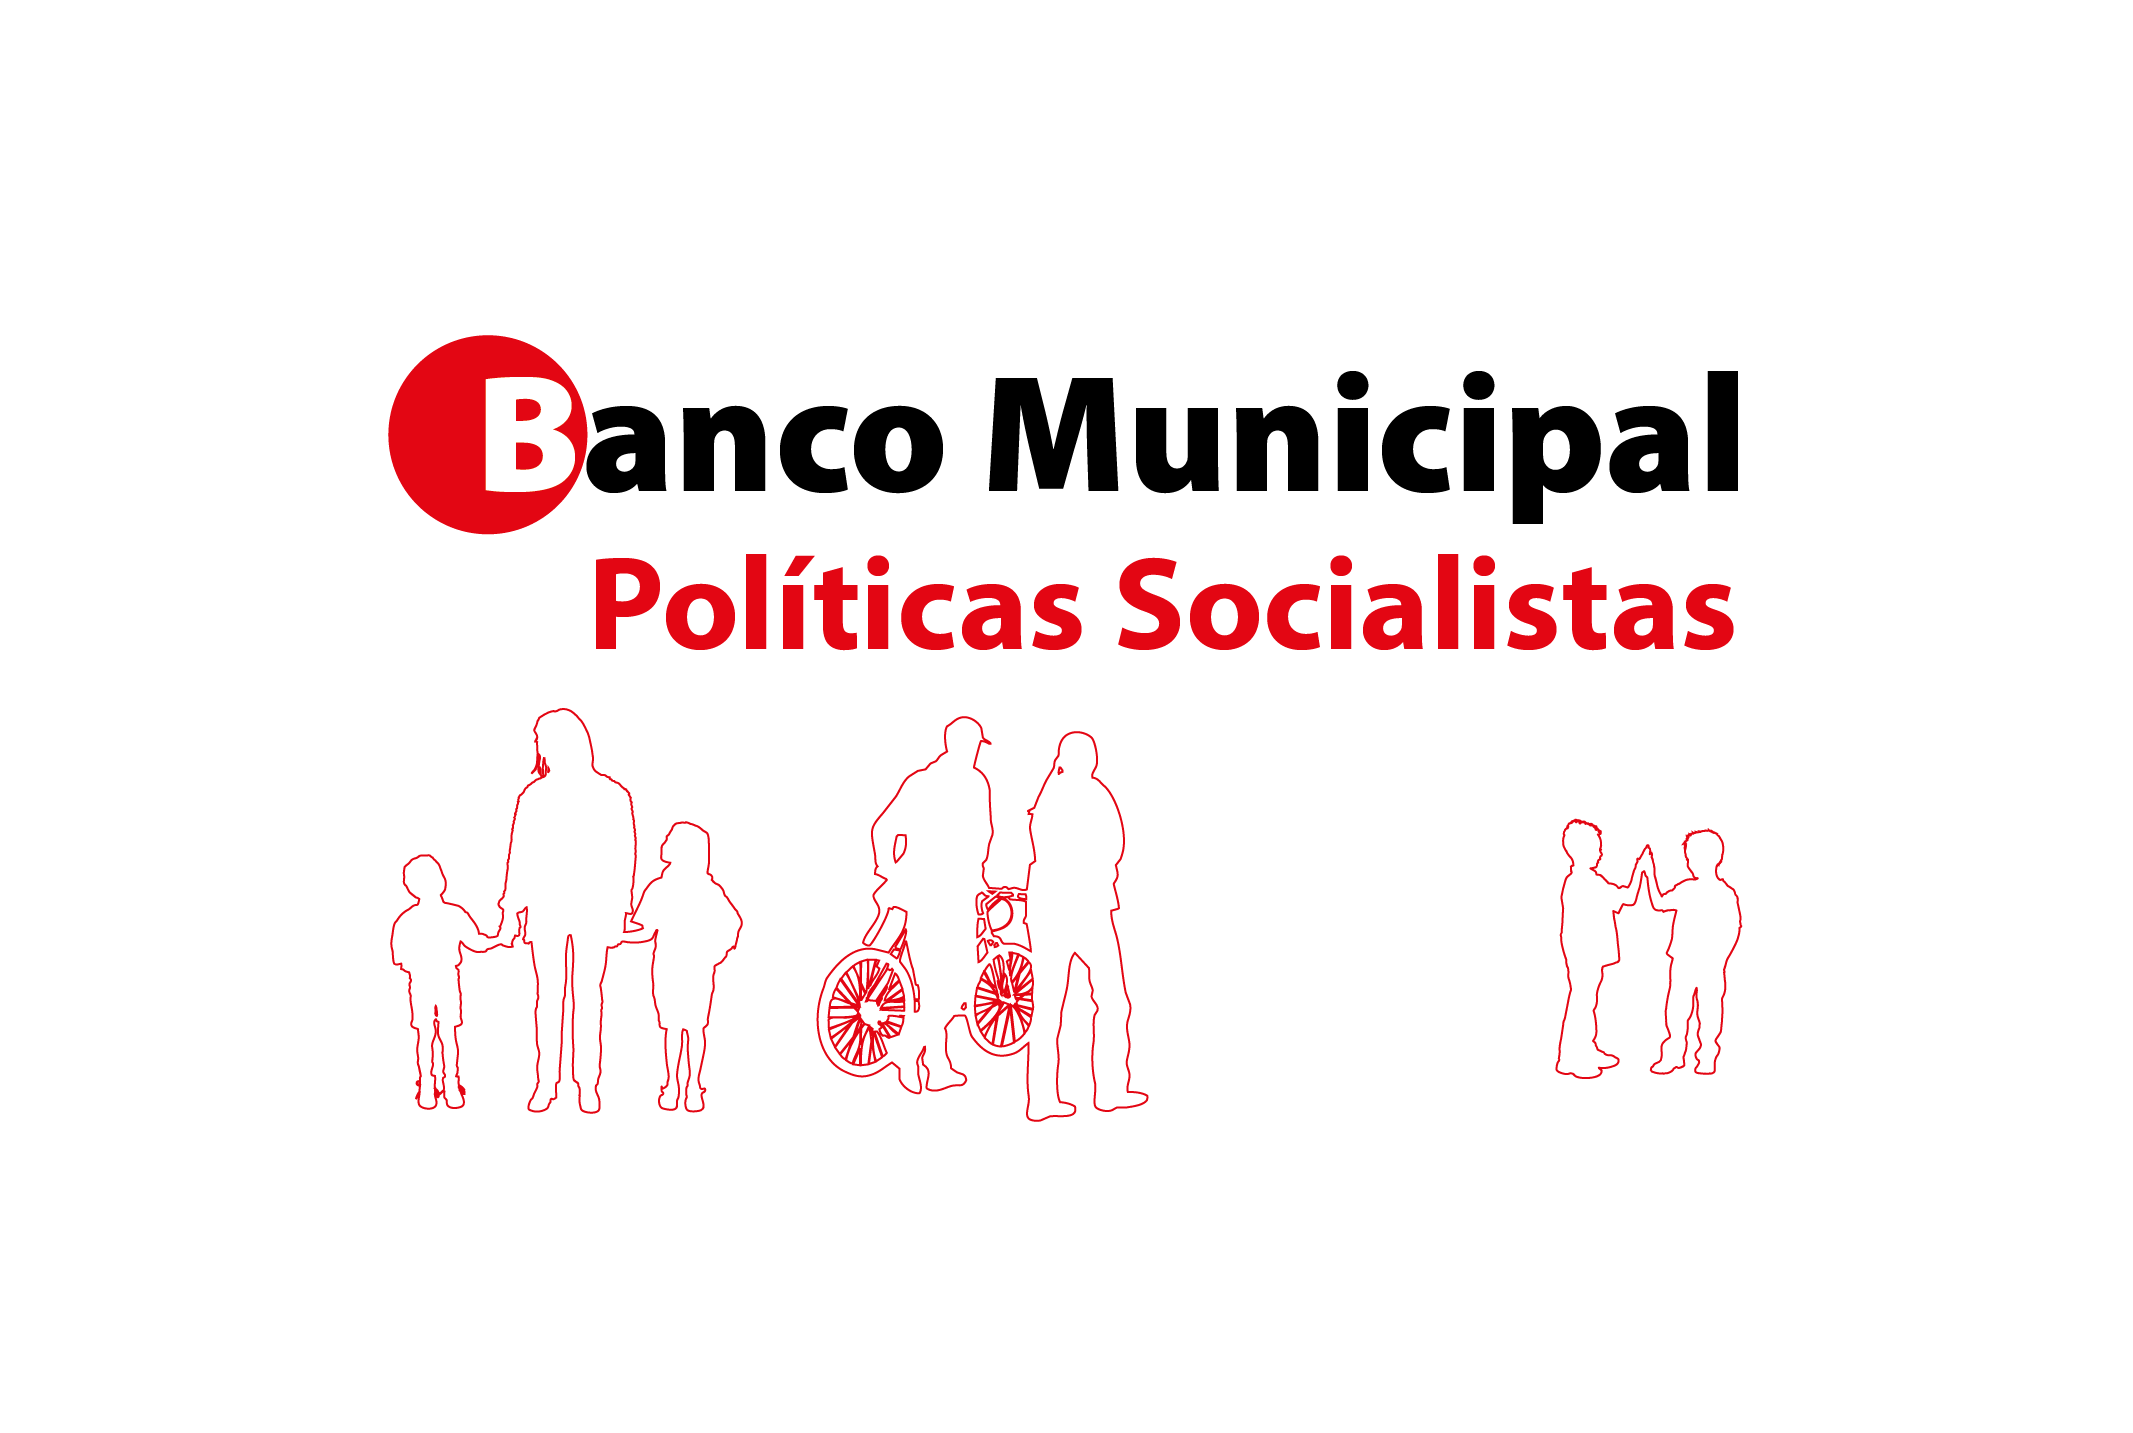 Banco Municipal de Políticas Socialistas